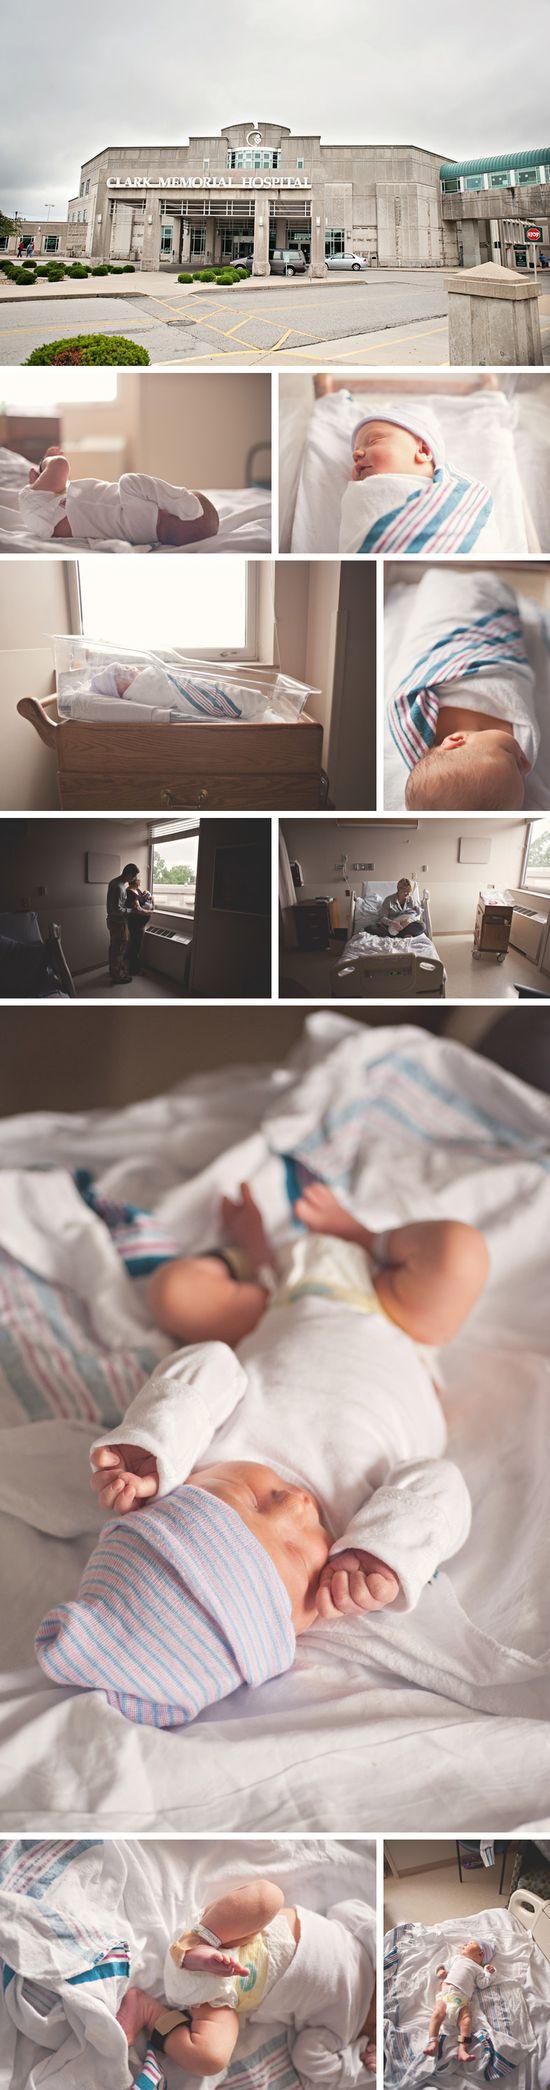 Hospital Newborn Photo Session